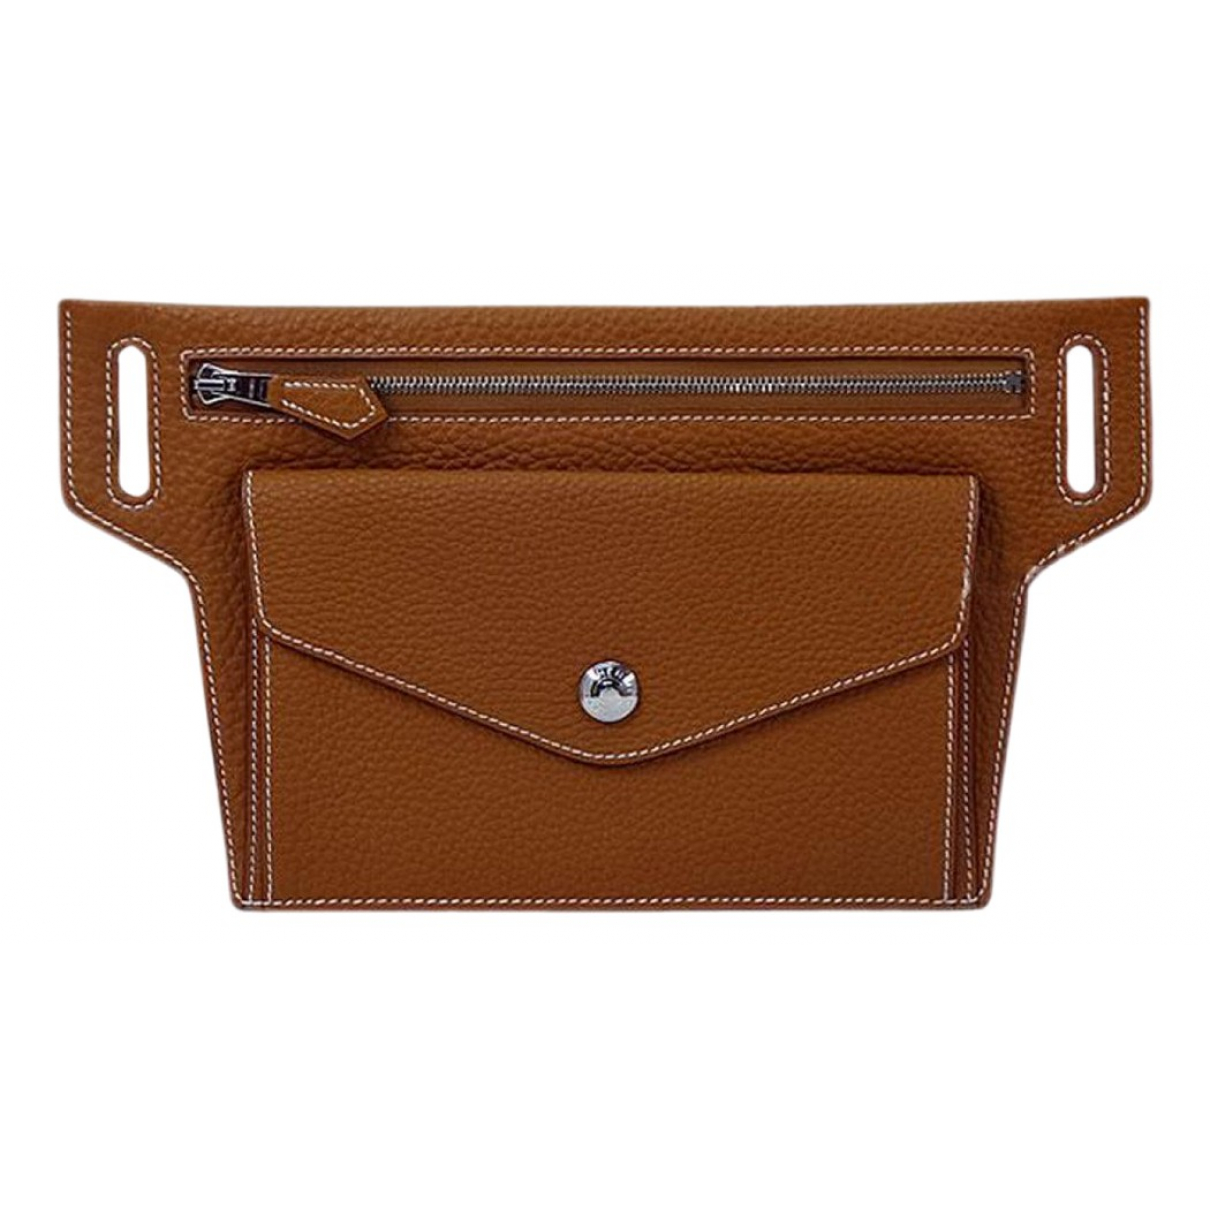 Hermès \N Brown Leather belt for Women XS